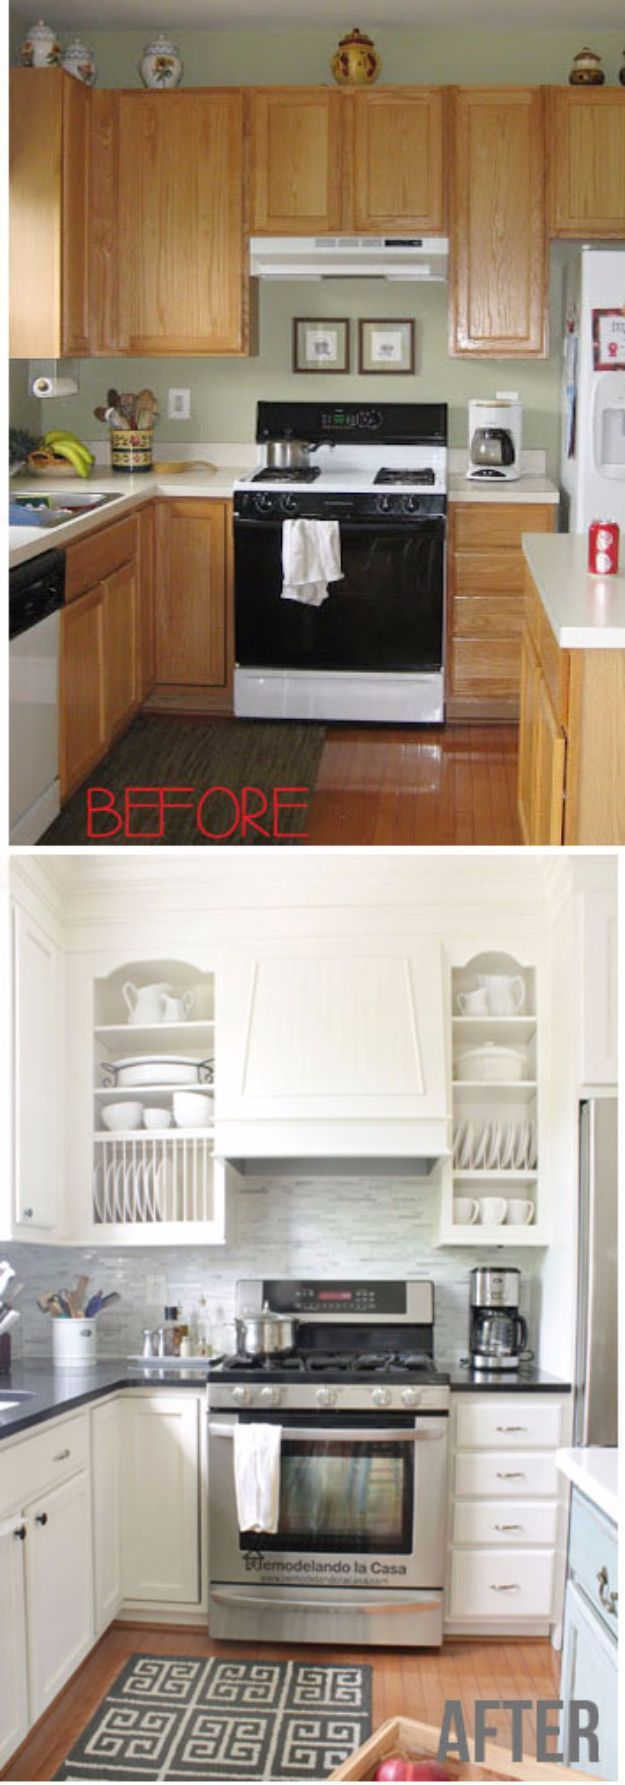 cabinet door makeover kitchen makeover ideas 37 Brilliant DIY Kitchen Makeover Ideas